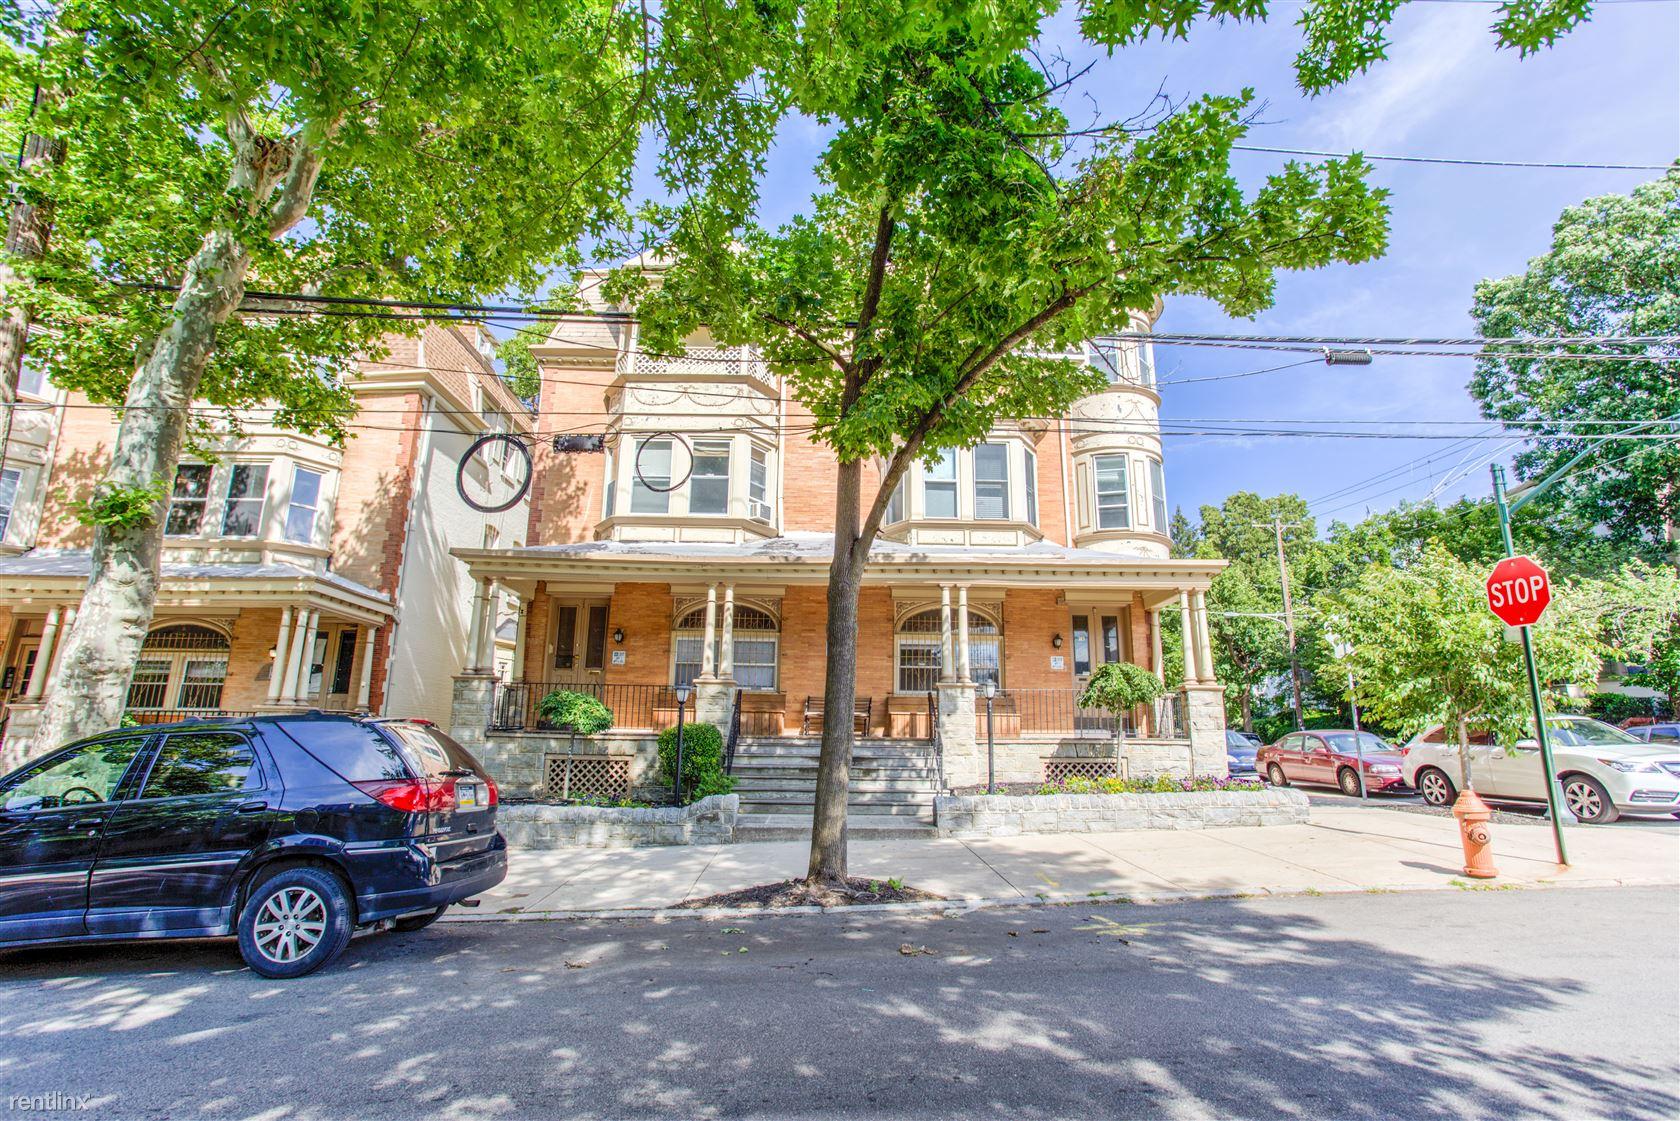 317 S 41st St, Philadelphia, PA - $4,900